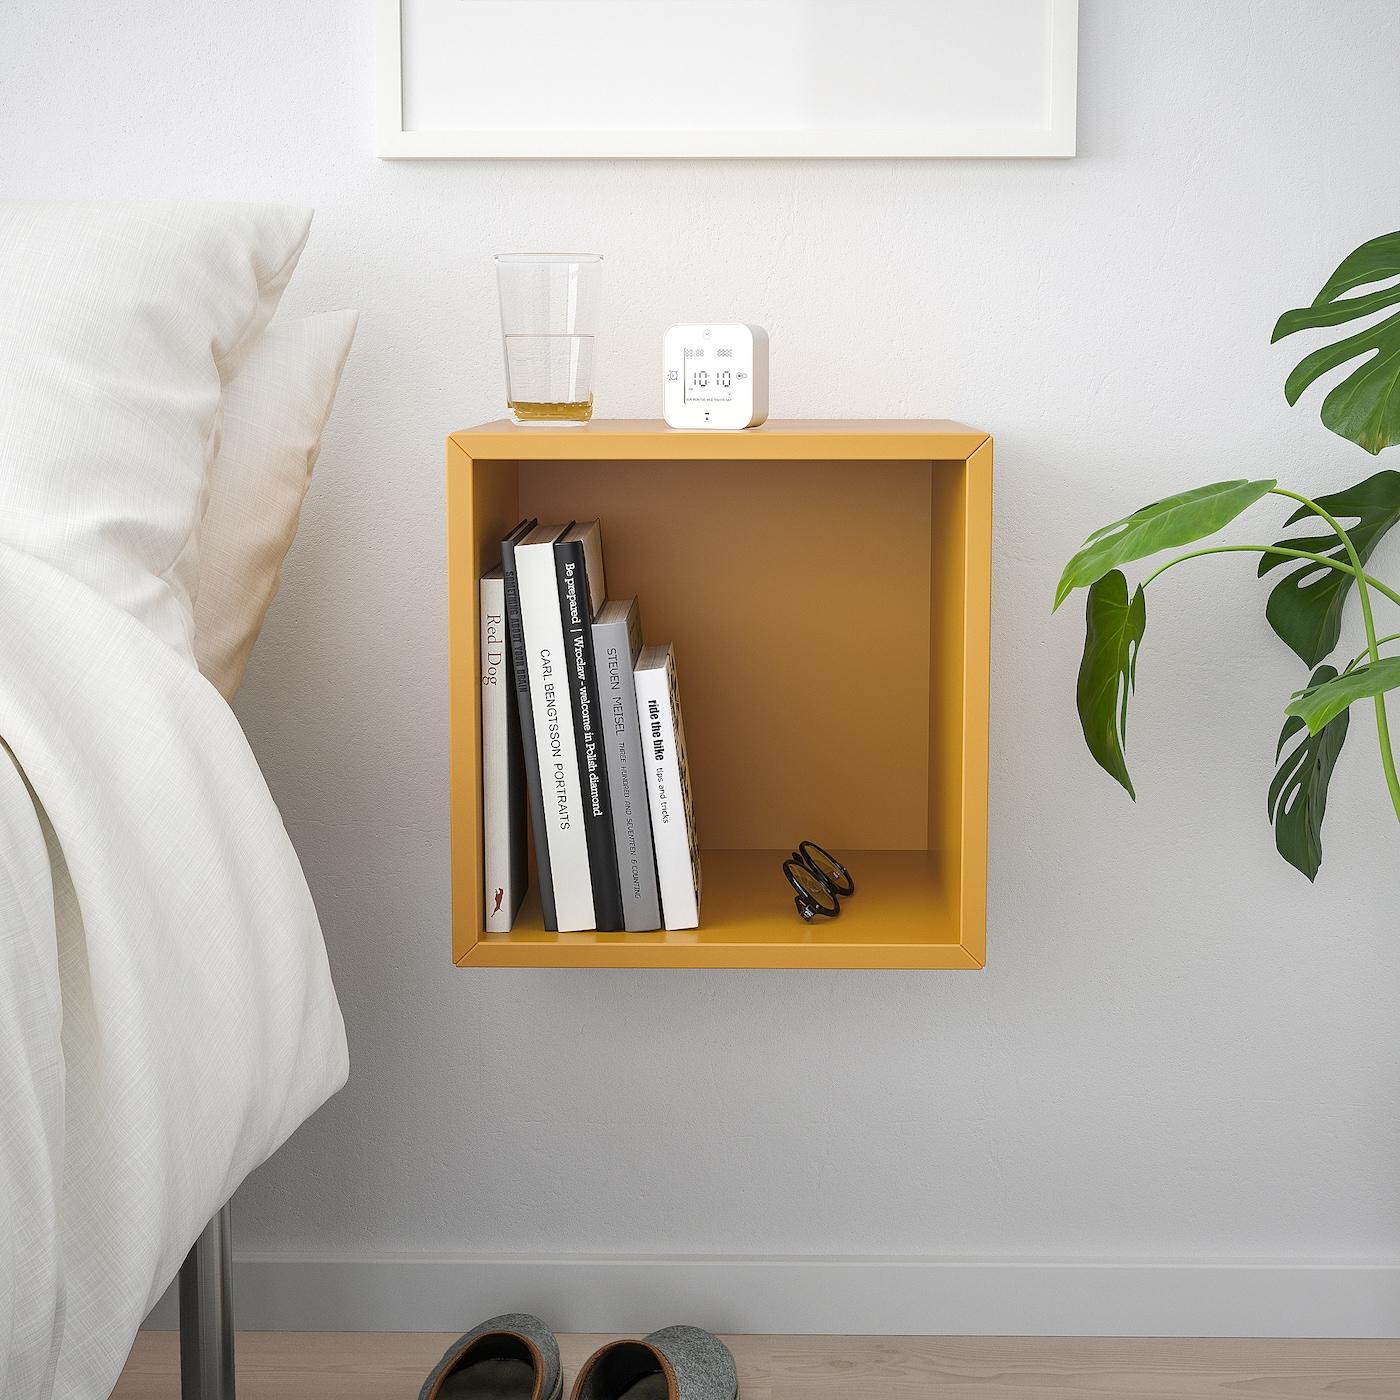 EKET Wall-mounted shelving unit, golden-brown, 35x35x35 cm